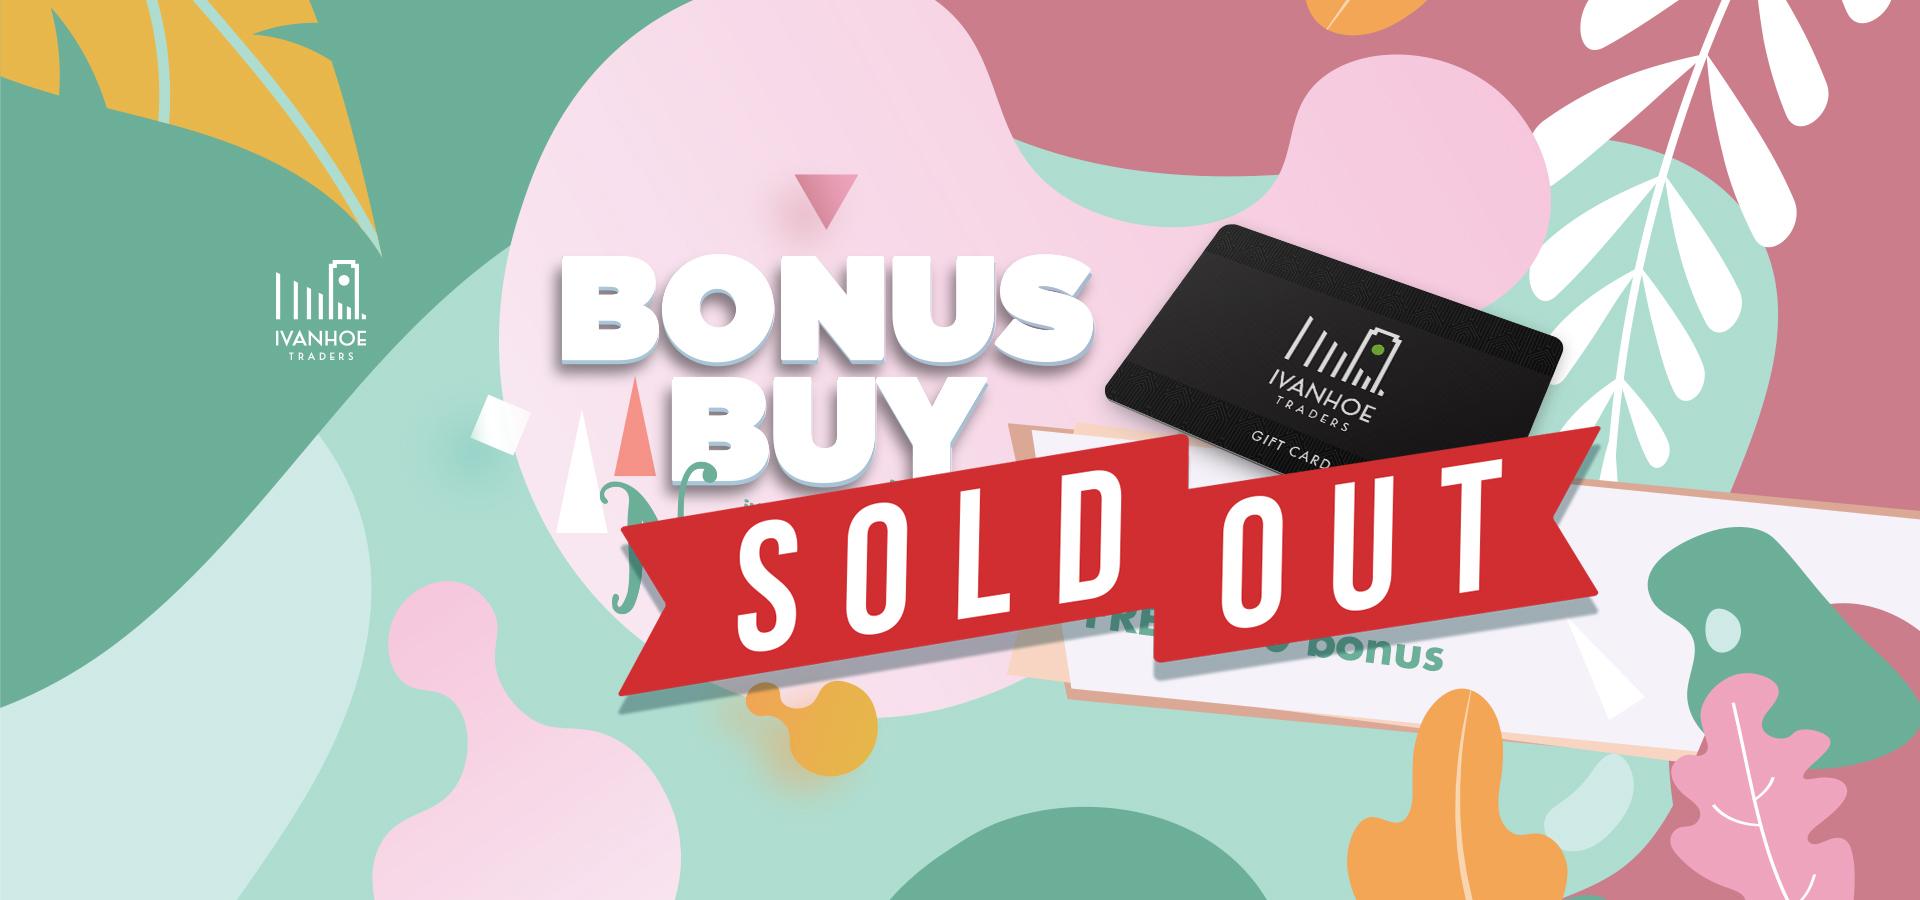 ITA-0096 Bonus-Buy-2020-Home-Sold-Out